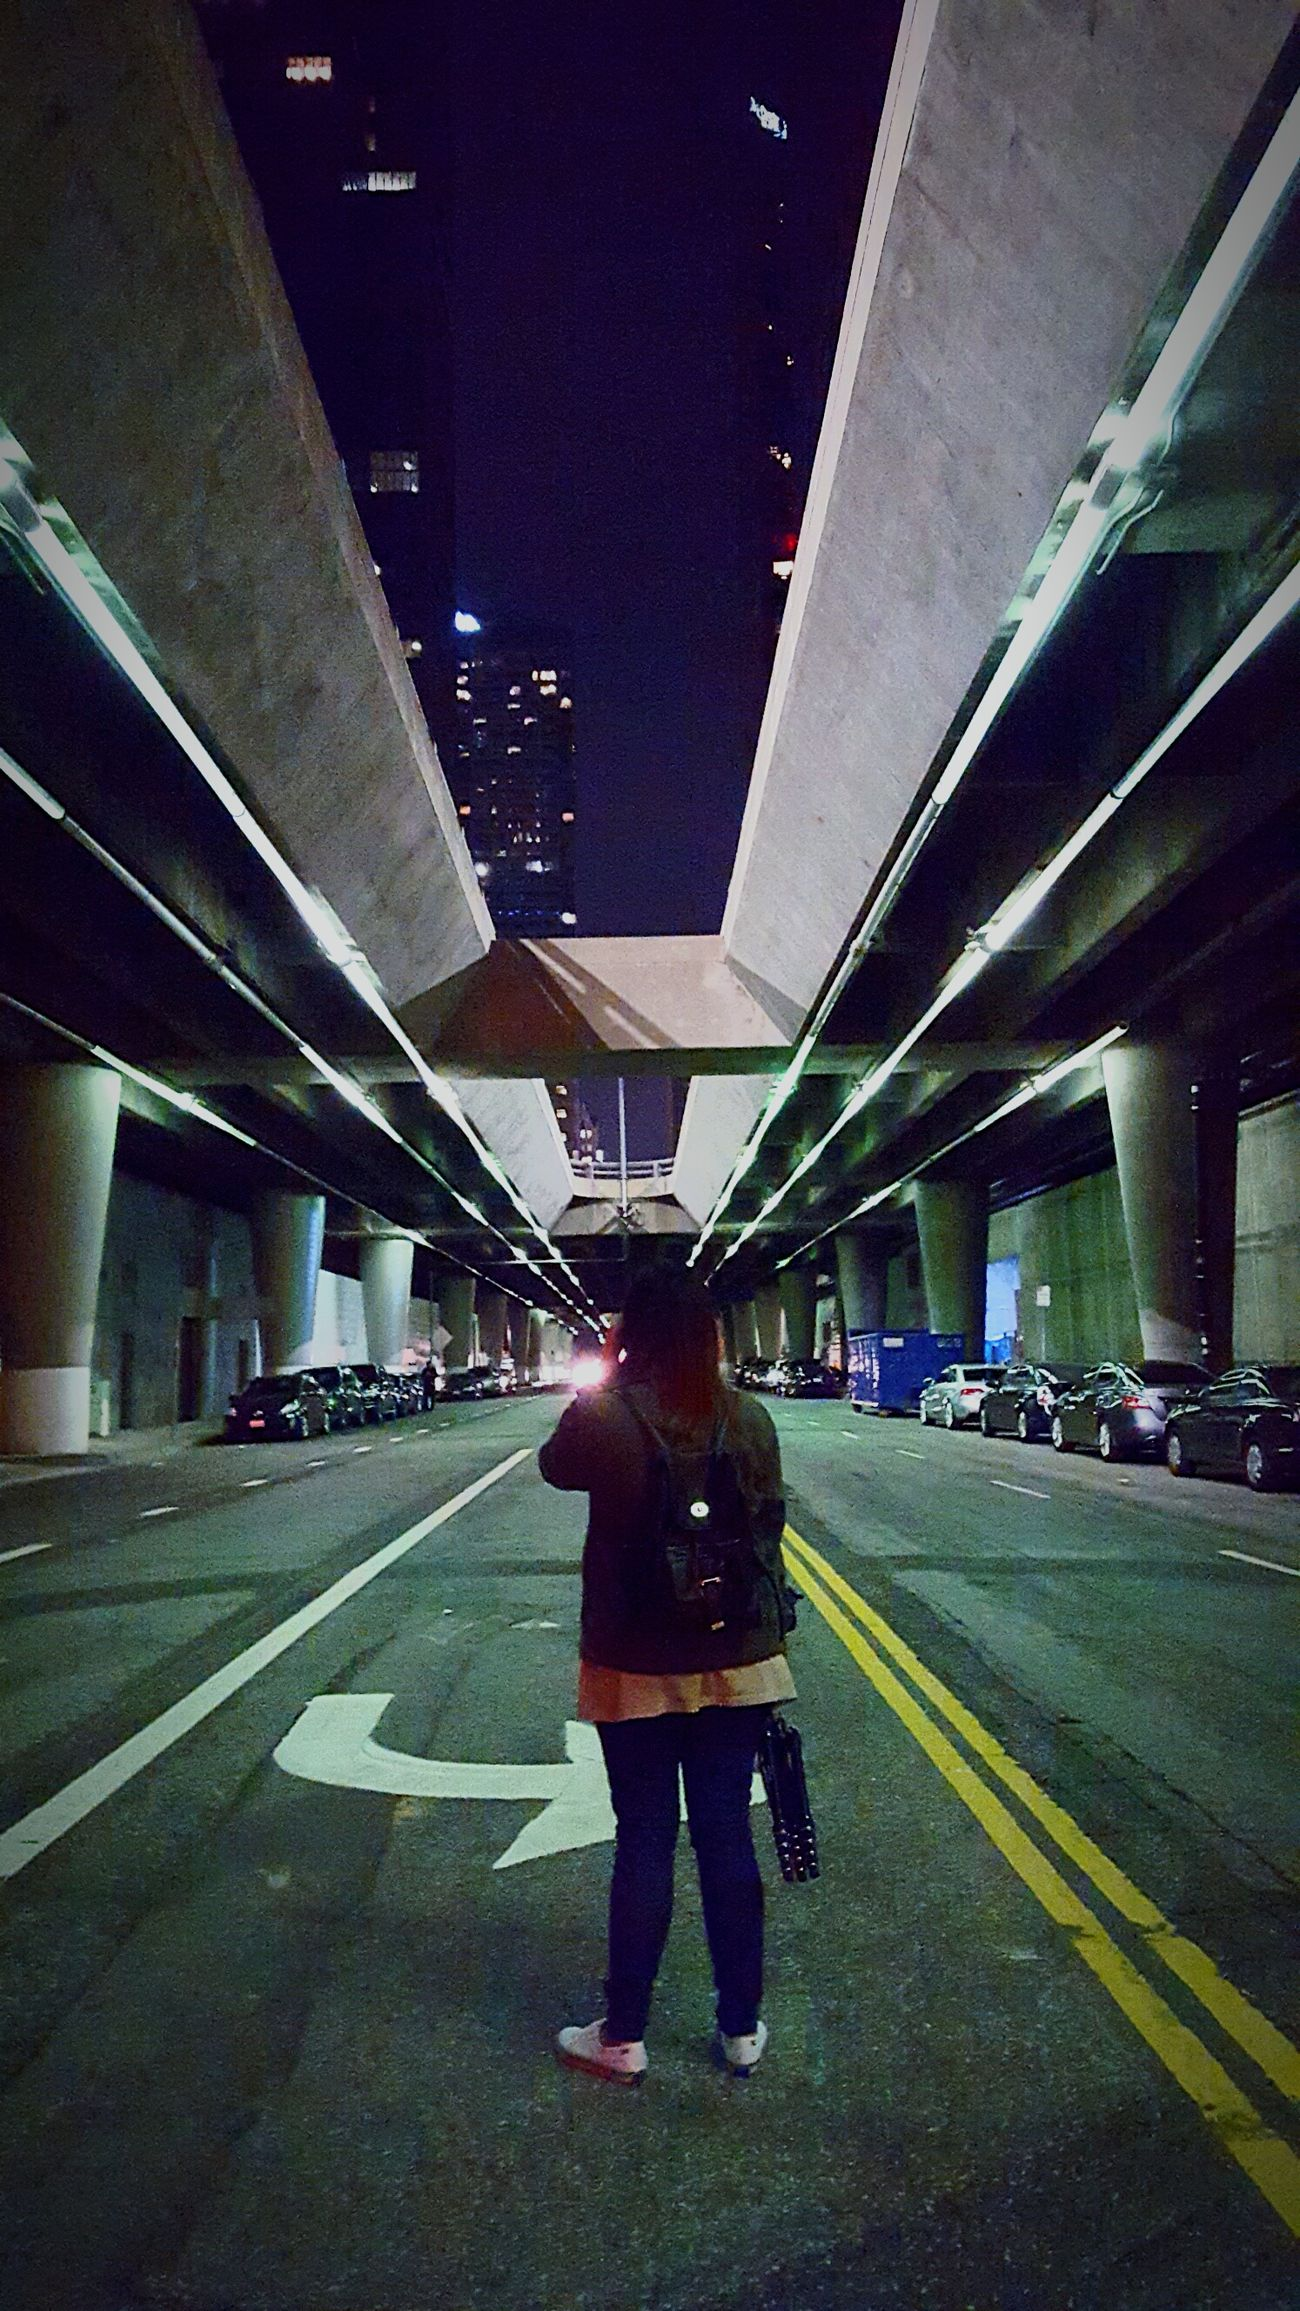 All The Neon Lights Streetphotography EyeEm Best Shots Showcase: January Losangeles ExploreLA Streetdreamsmag